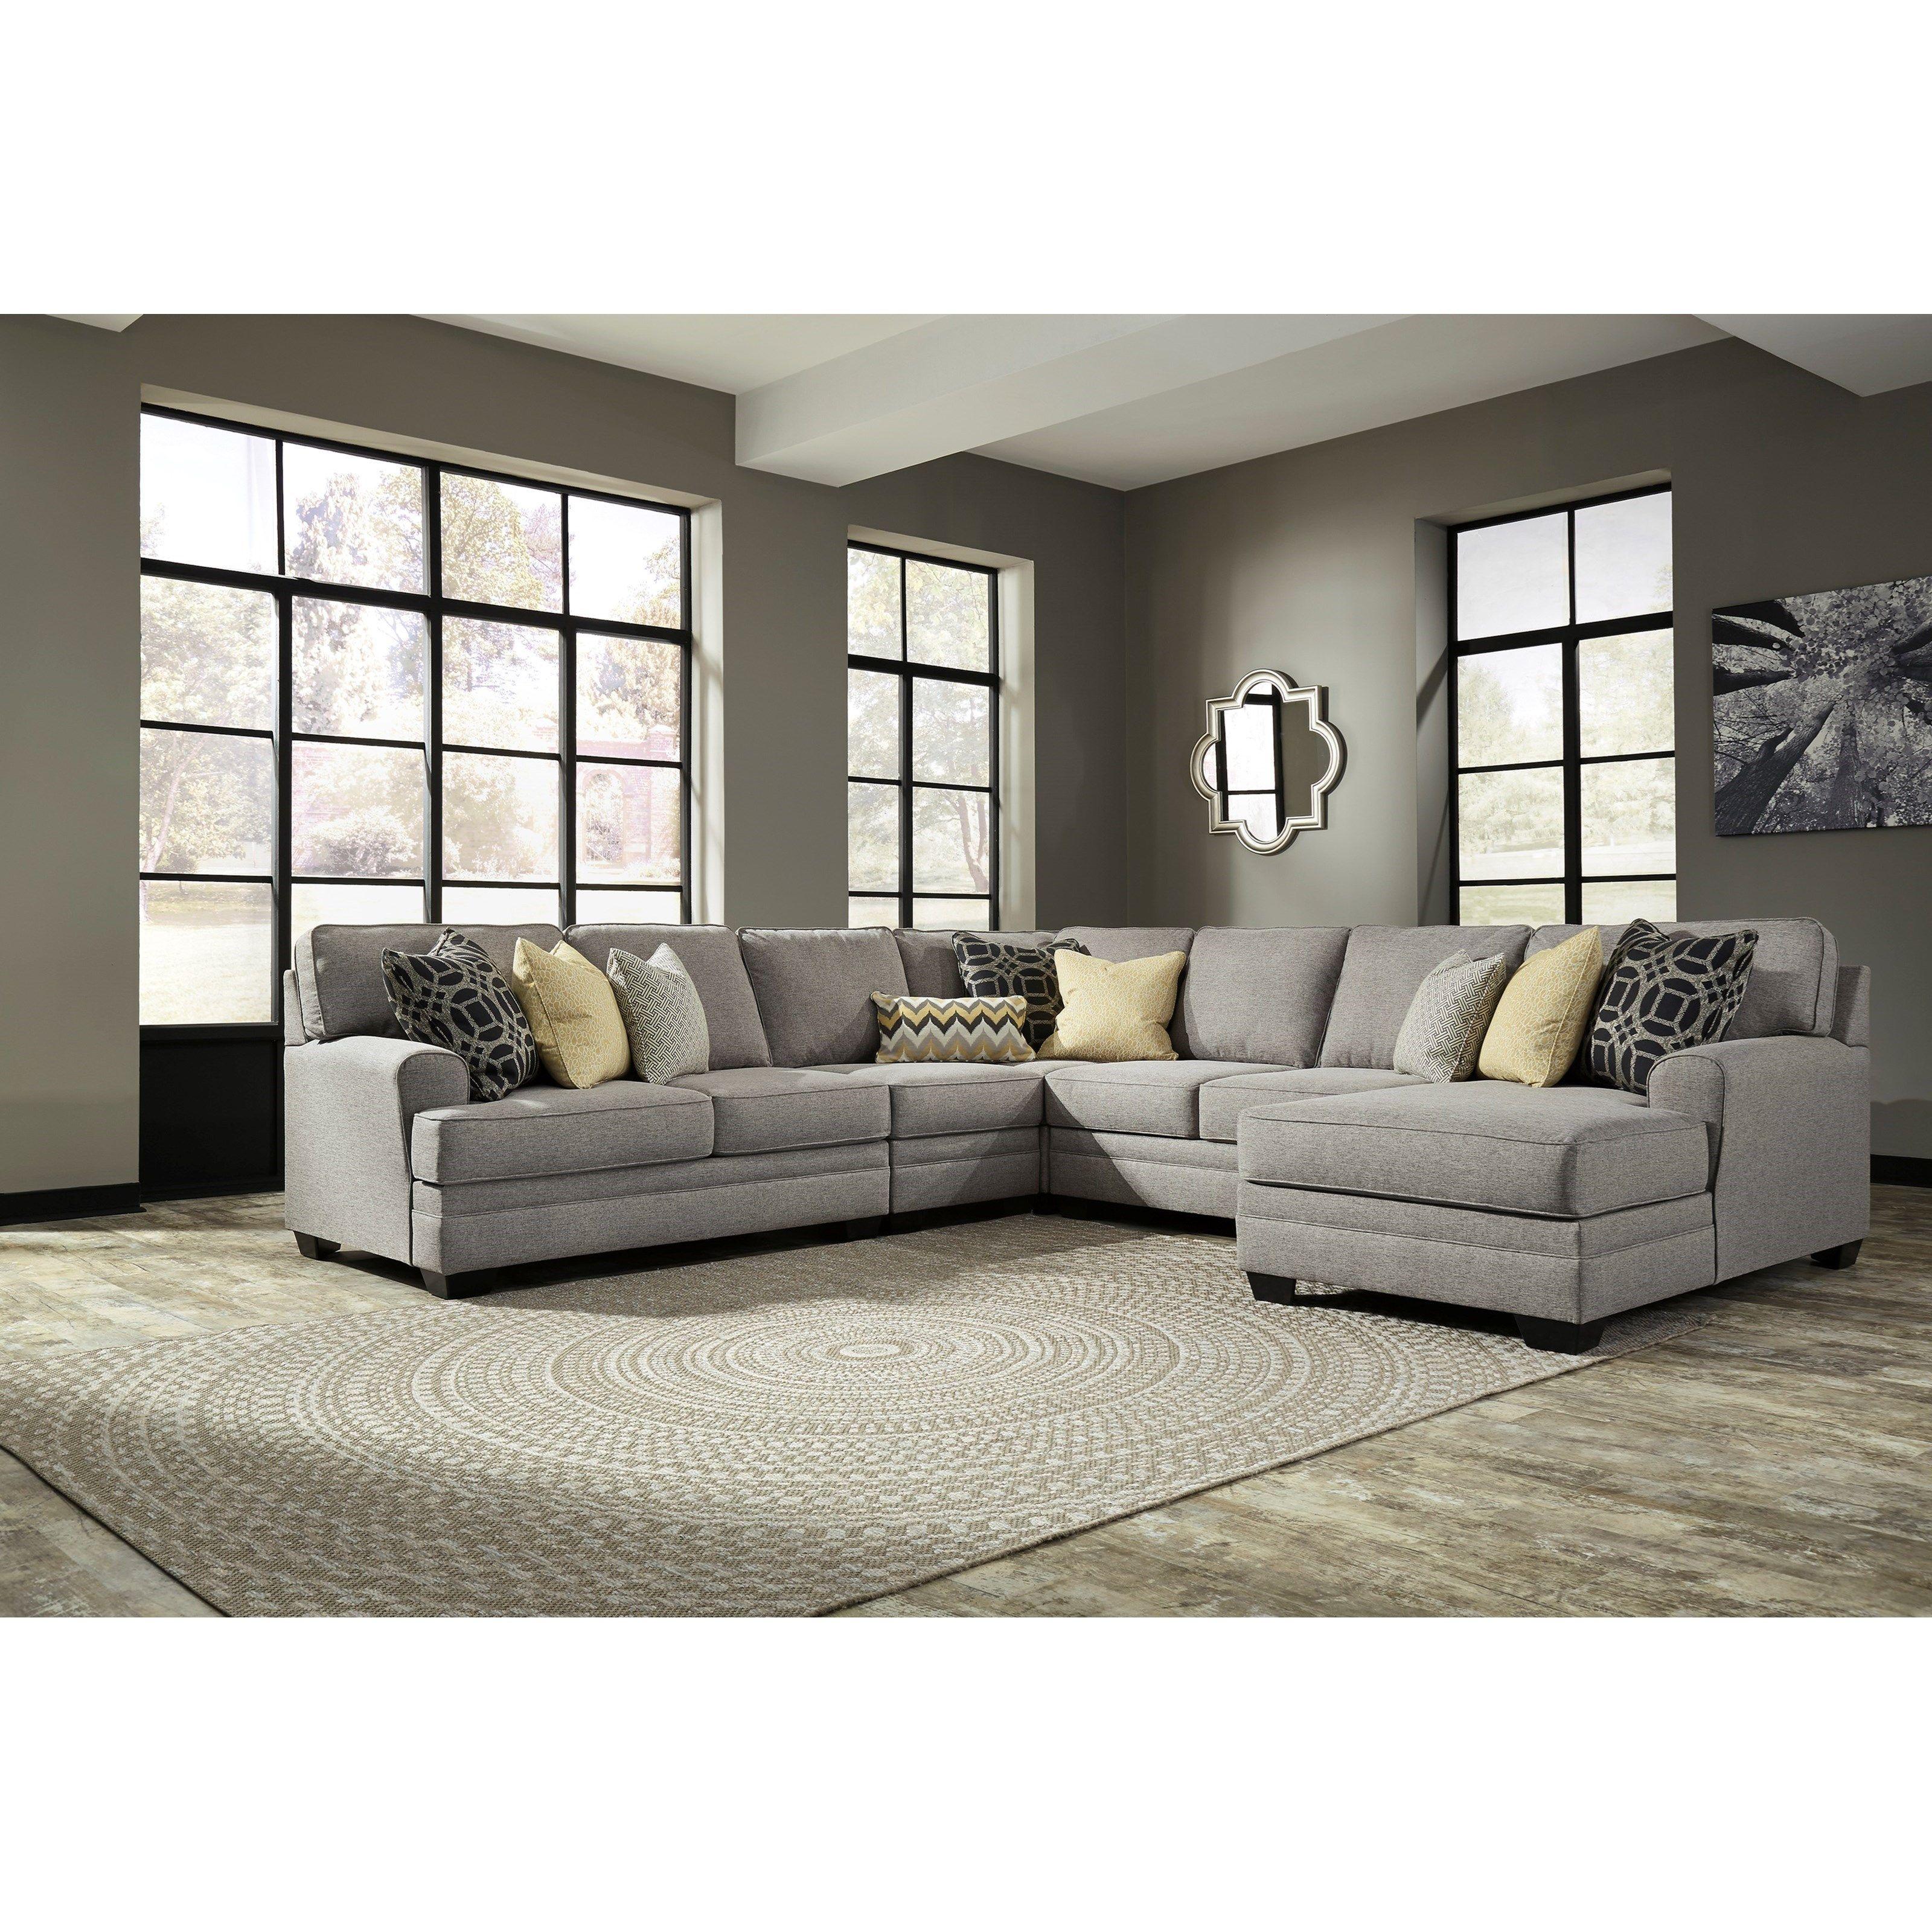 Highpointfair New Design Modern Sofa From Cocheen Sofaset Sofa Modernsofa Cocheendesign Livingroomsofa Furnitur Sofa Manufacturers Modern Sofa Sofa Set